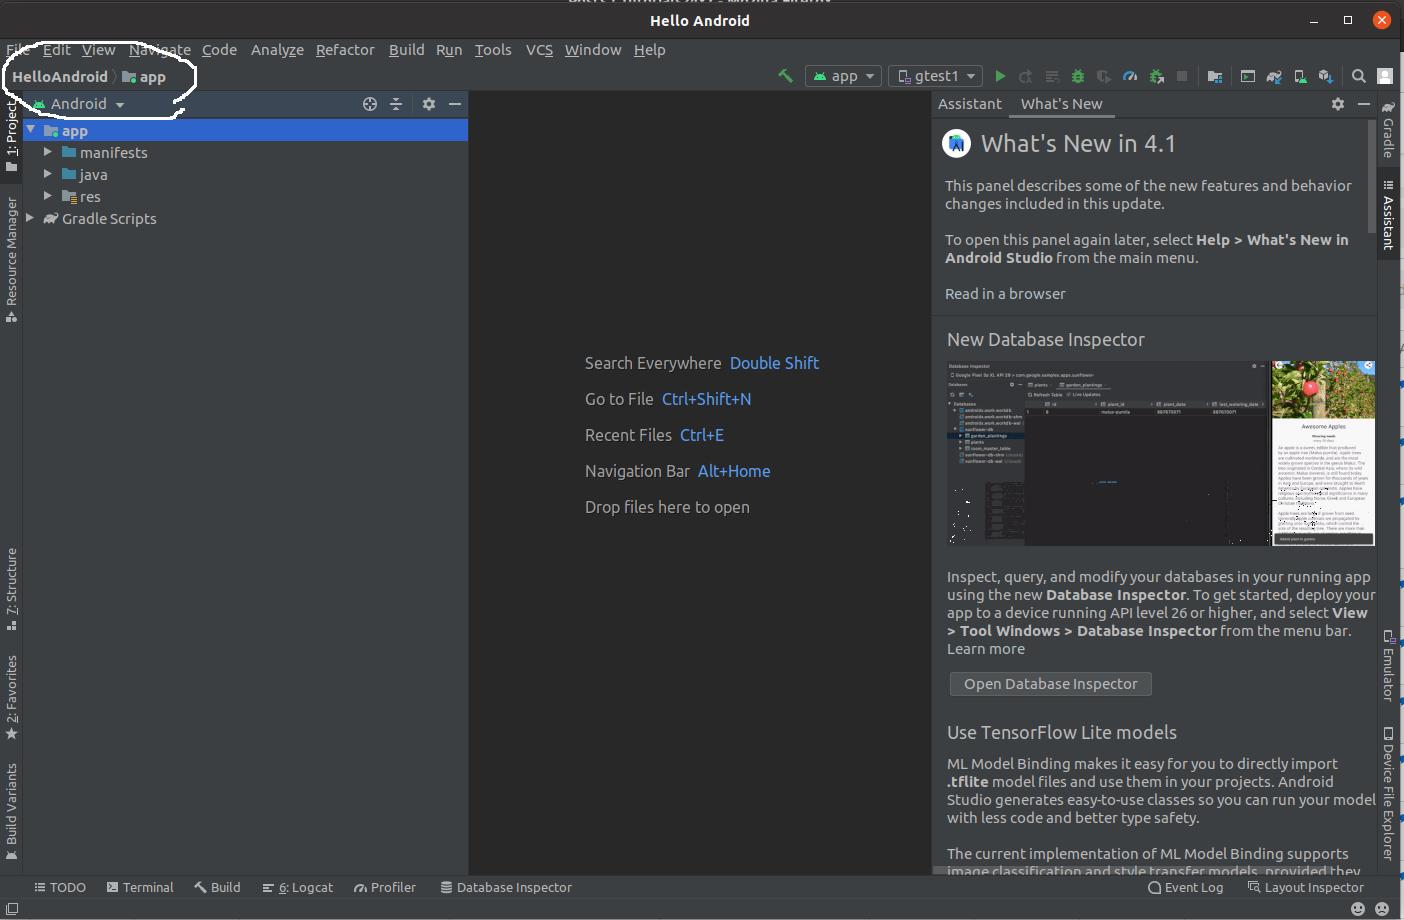 Install Andriod Studio On Ubuntu 20.04 - Workspace